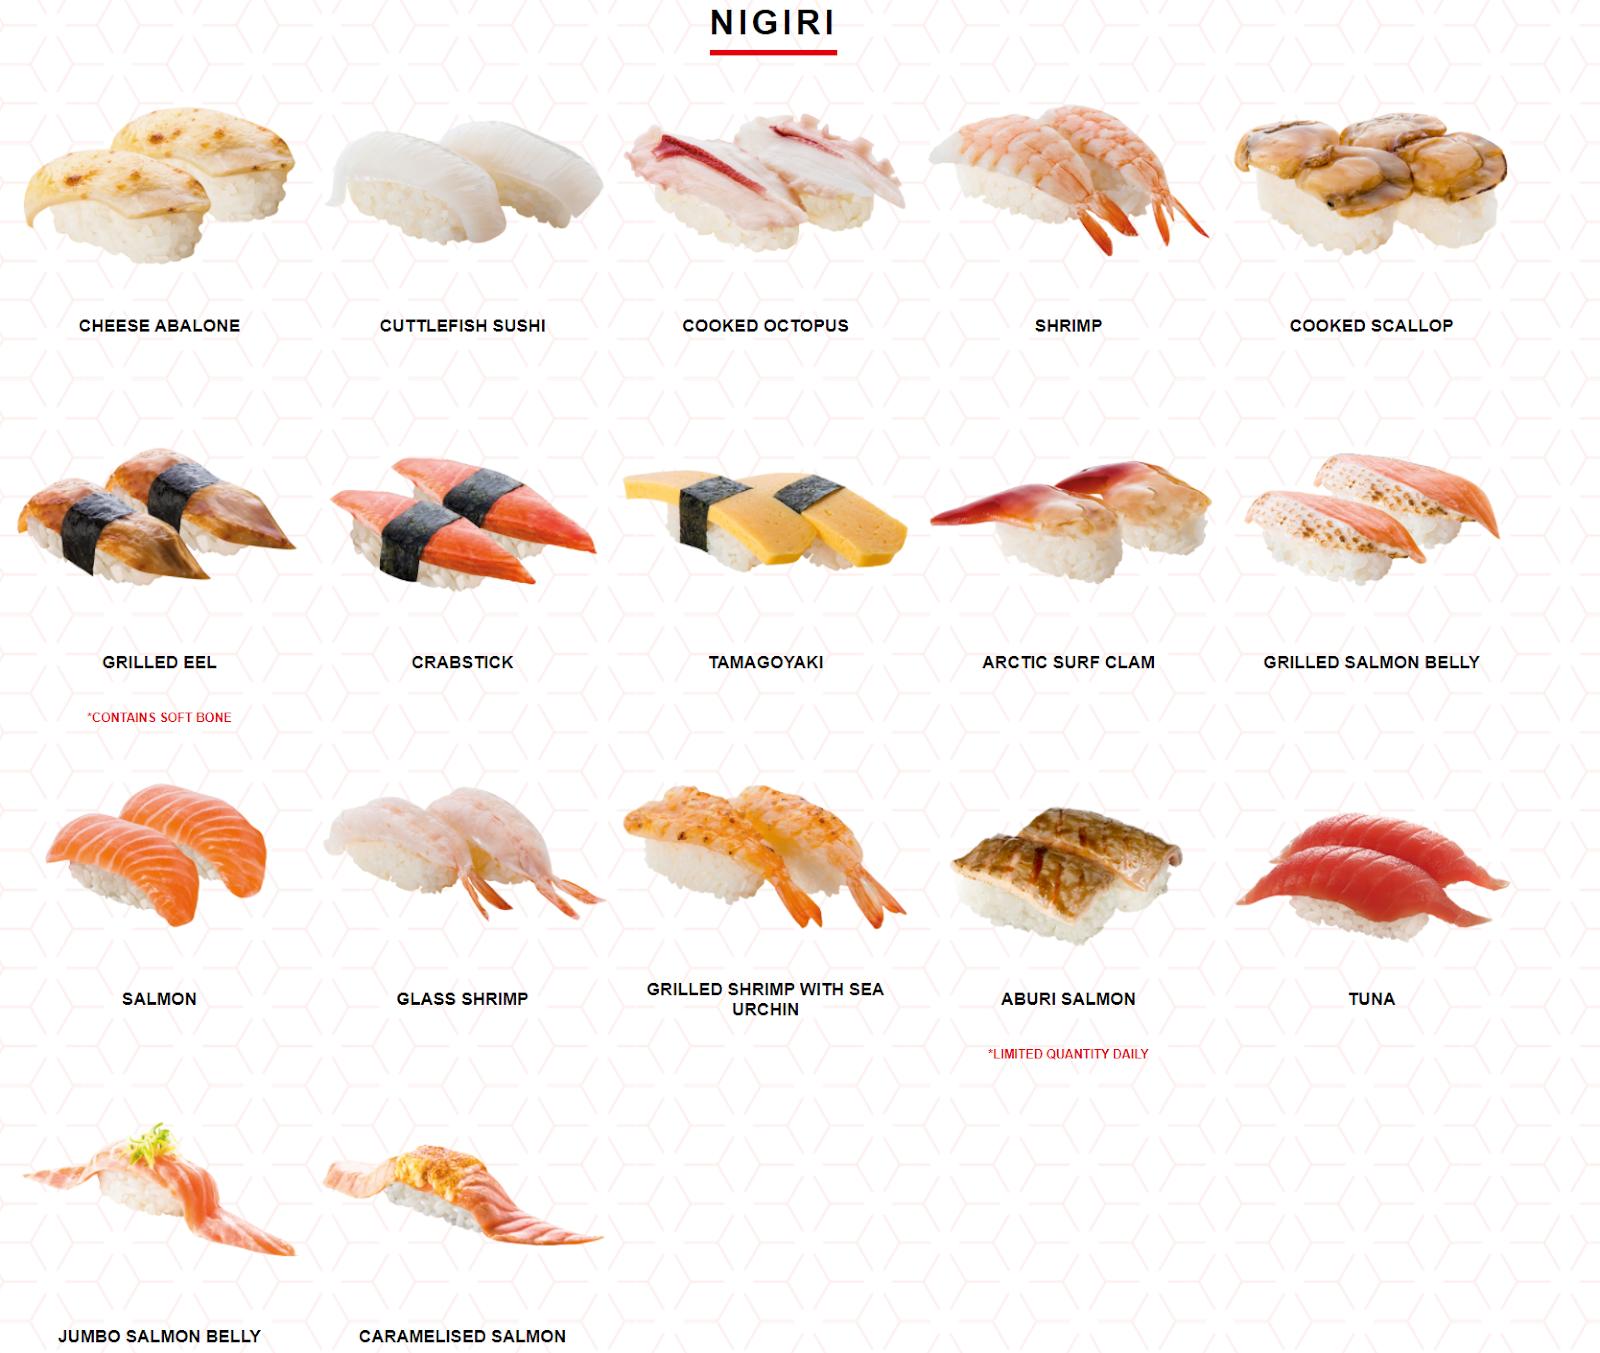 4ORe5DibGXbZO2 ntSUOLcy KVKL0uQ01Denzz8UxMUJ4HjjWSPe2auskRLwNDwX2wM45hwVV4nyQFHf4ysVPjhBh0VxoXI3Bvuc1c0694daP4cuMdti23xEr1xmOqs qe1dpW6  - [2021]Sushi Express Singapore Review | Ultimate Order Hacks